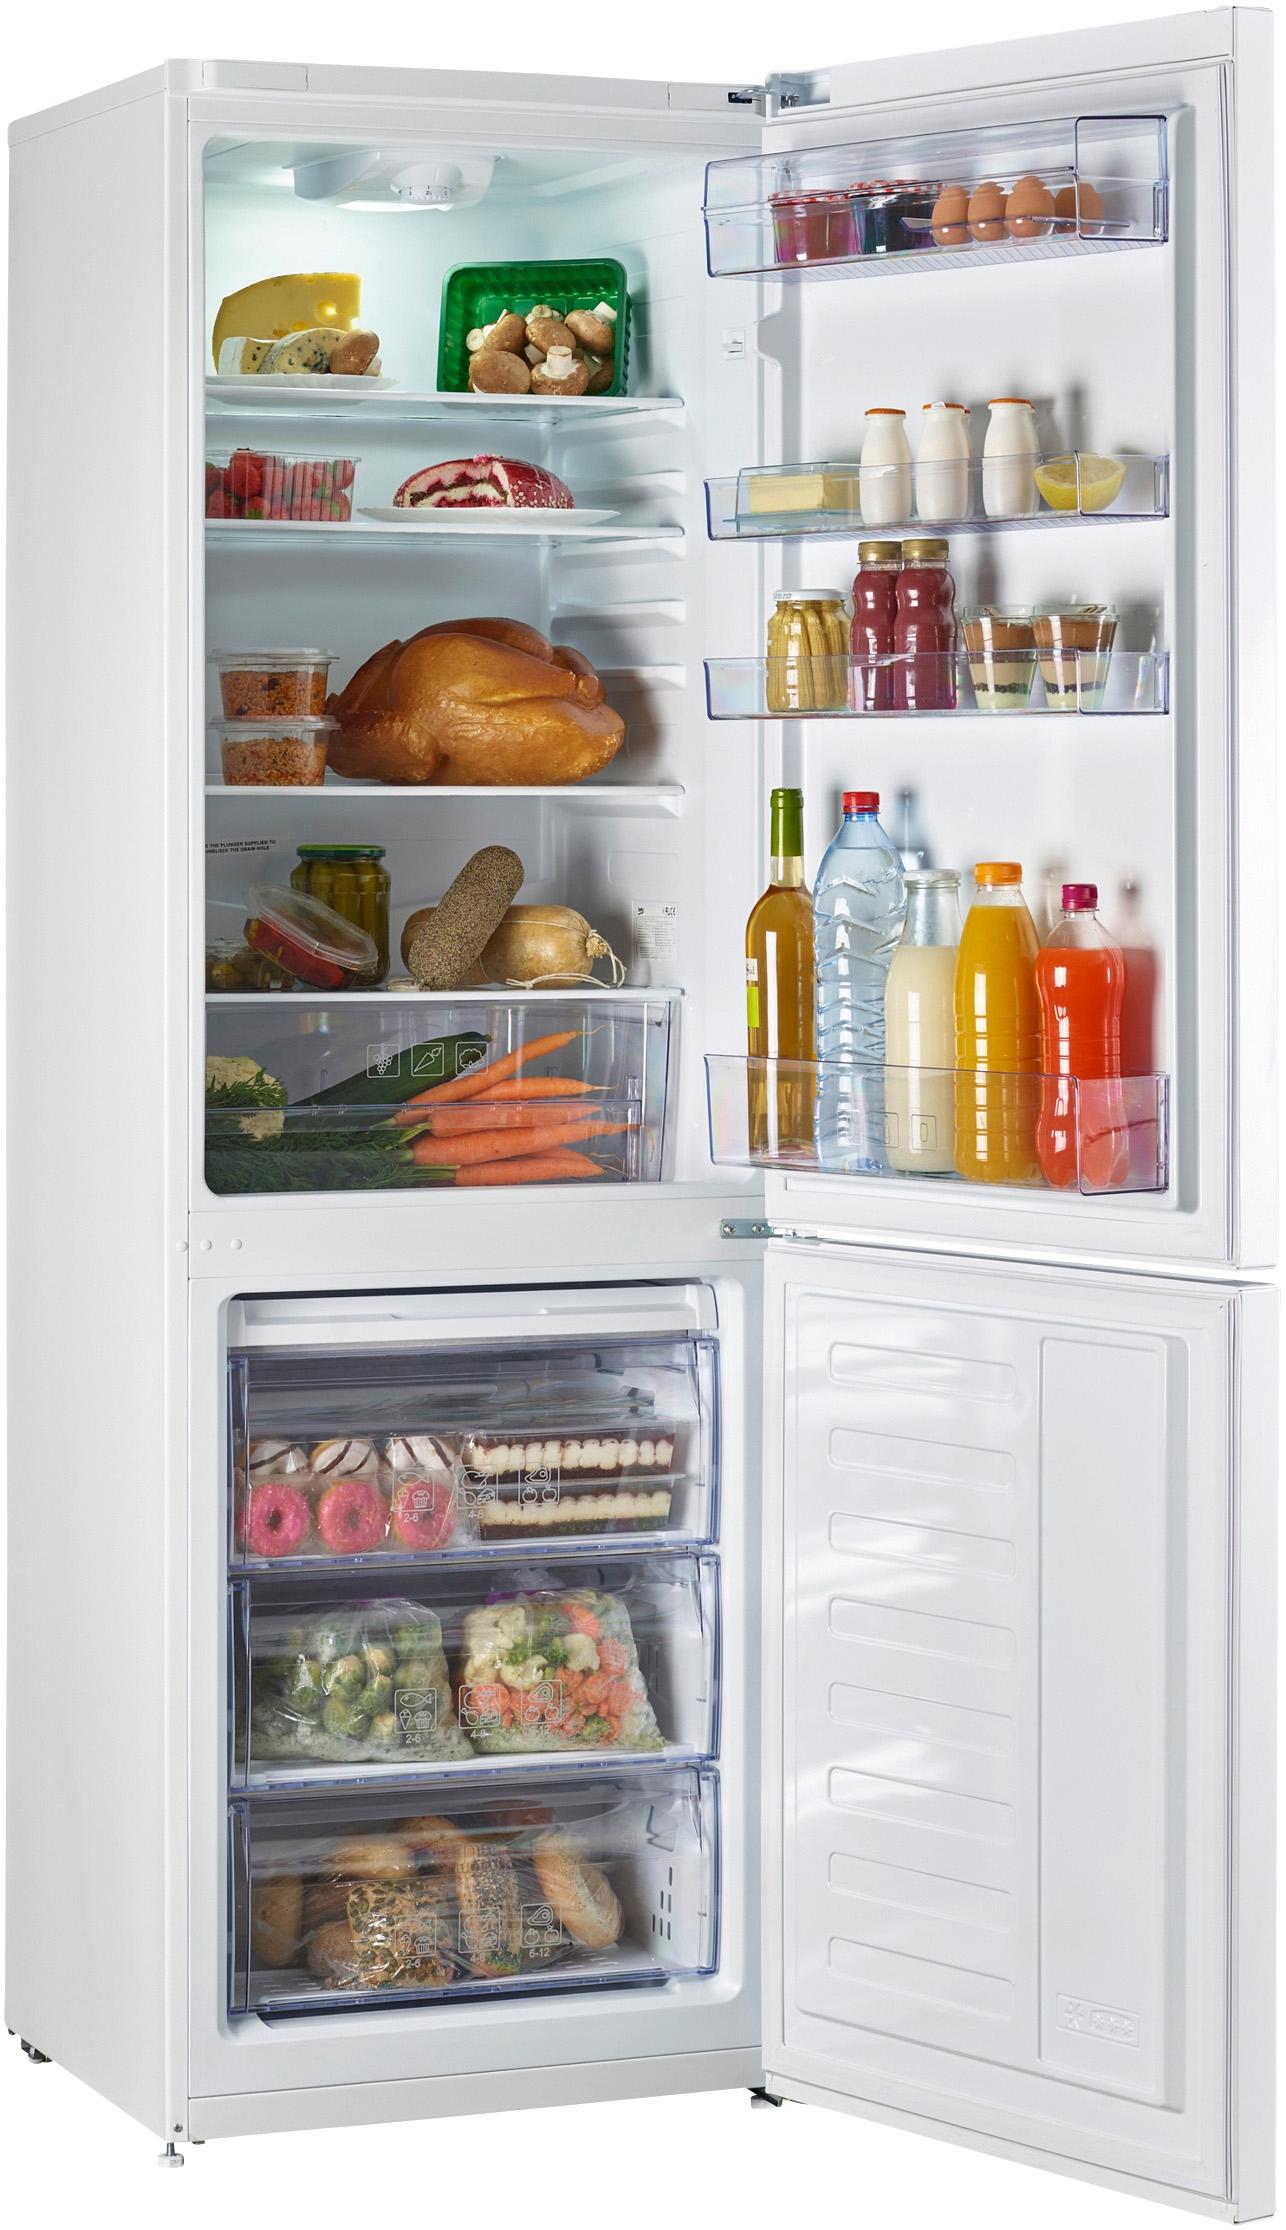 I dettagli del test sul frigorifero BEKO RCSA330K20W